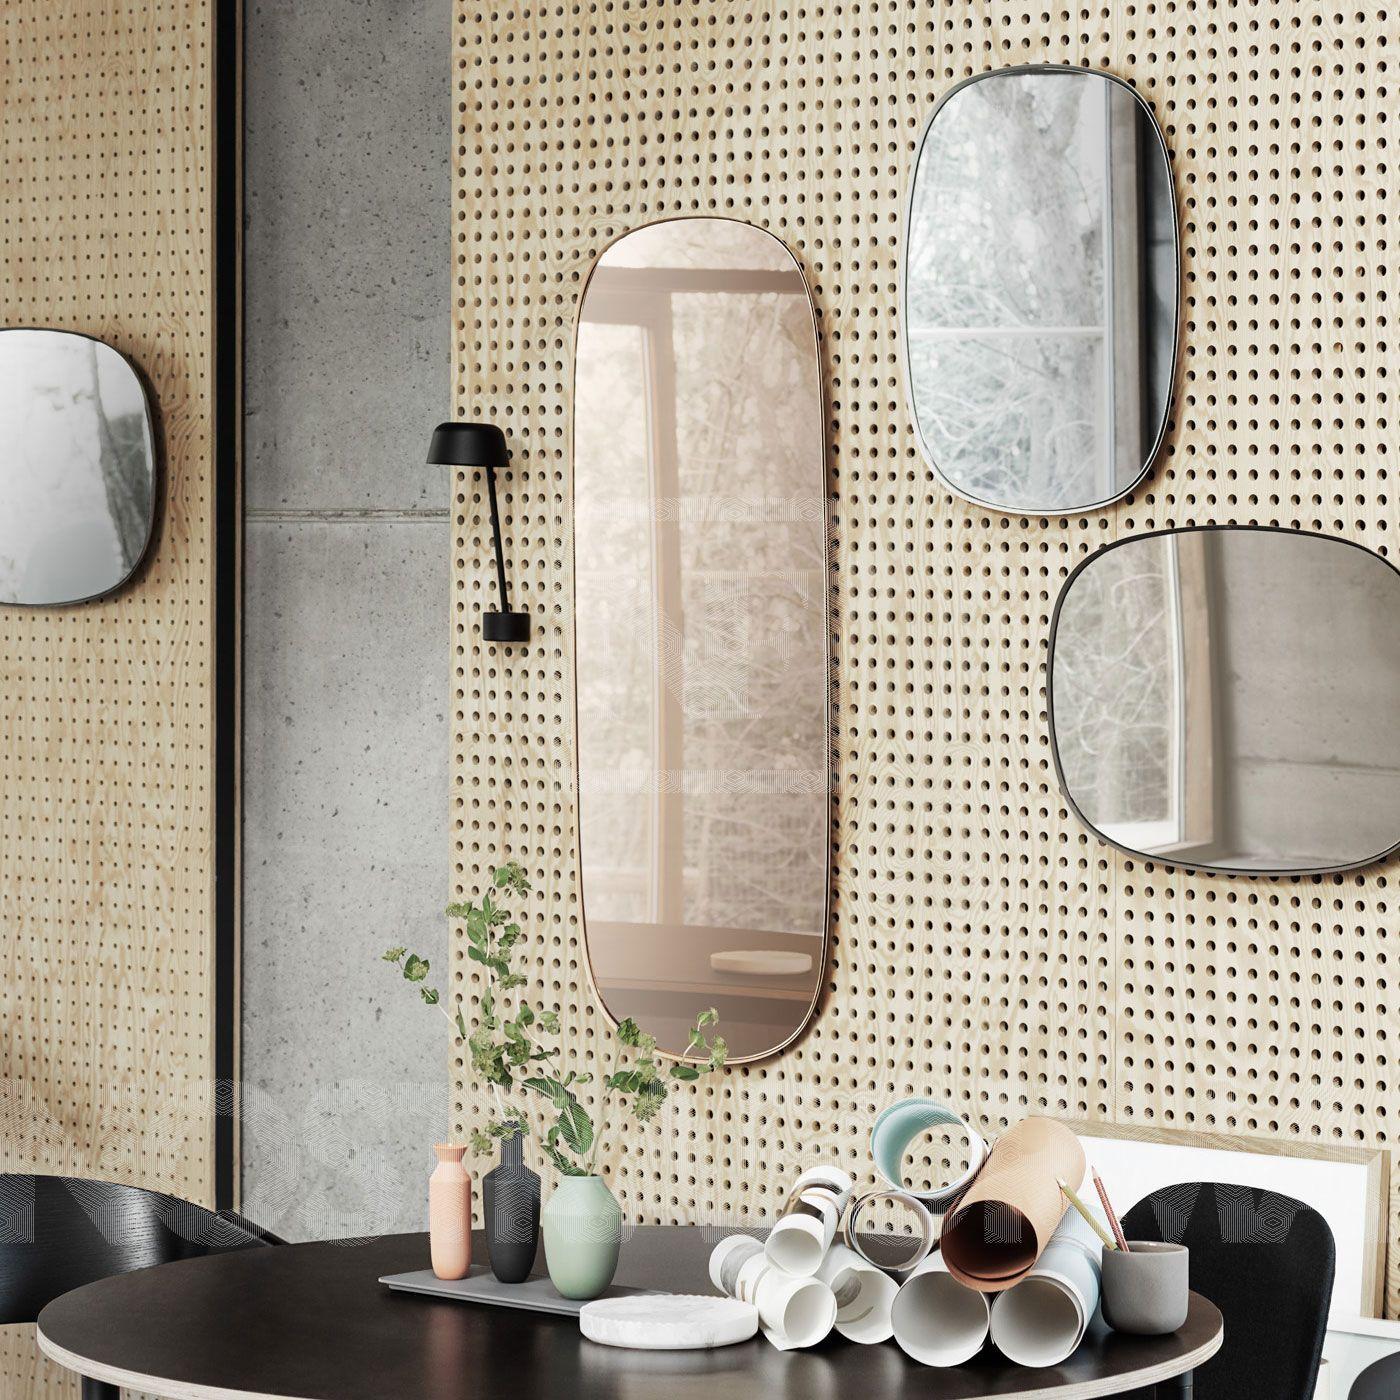 Muuto Framed Spiegel Gross Skandinavische Inneneinrichtung Skandinavisch Einrichten Moderne Dekoration